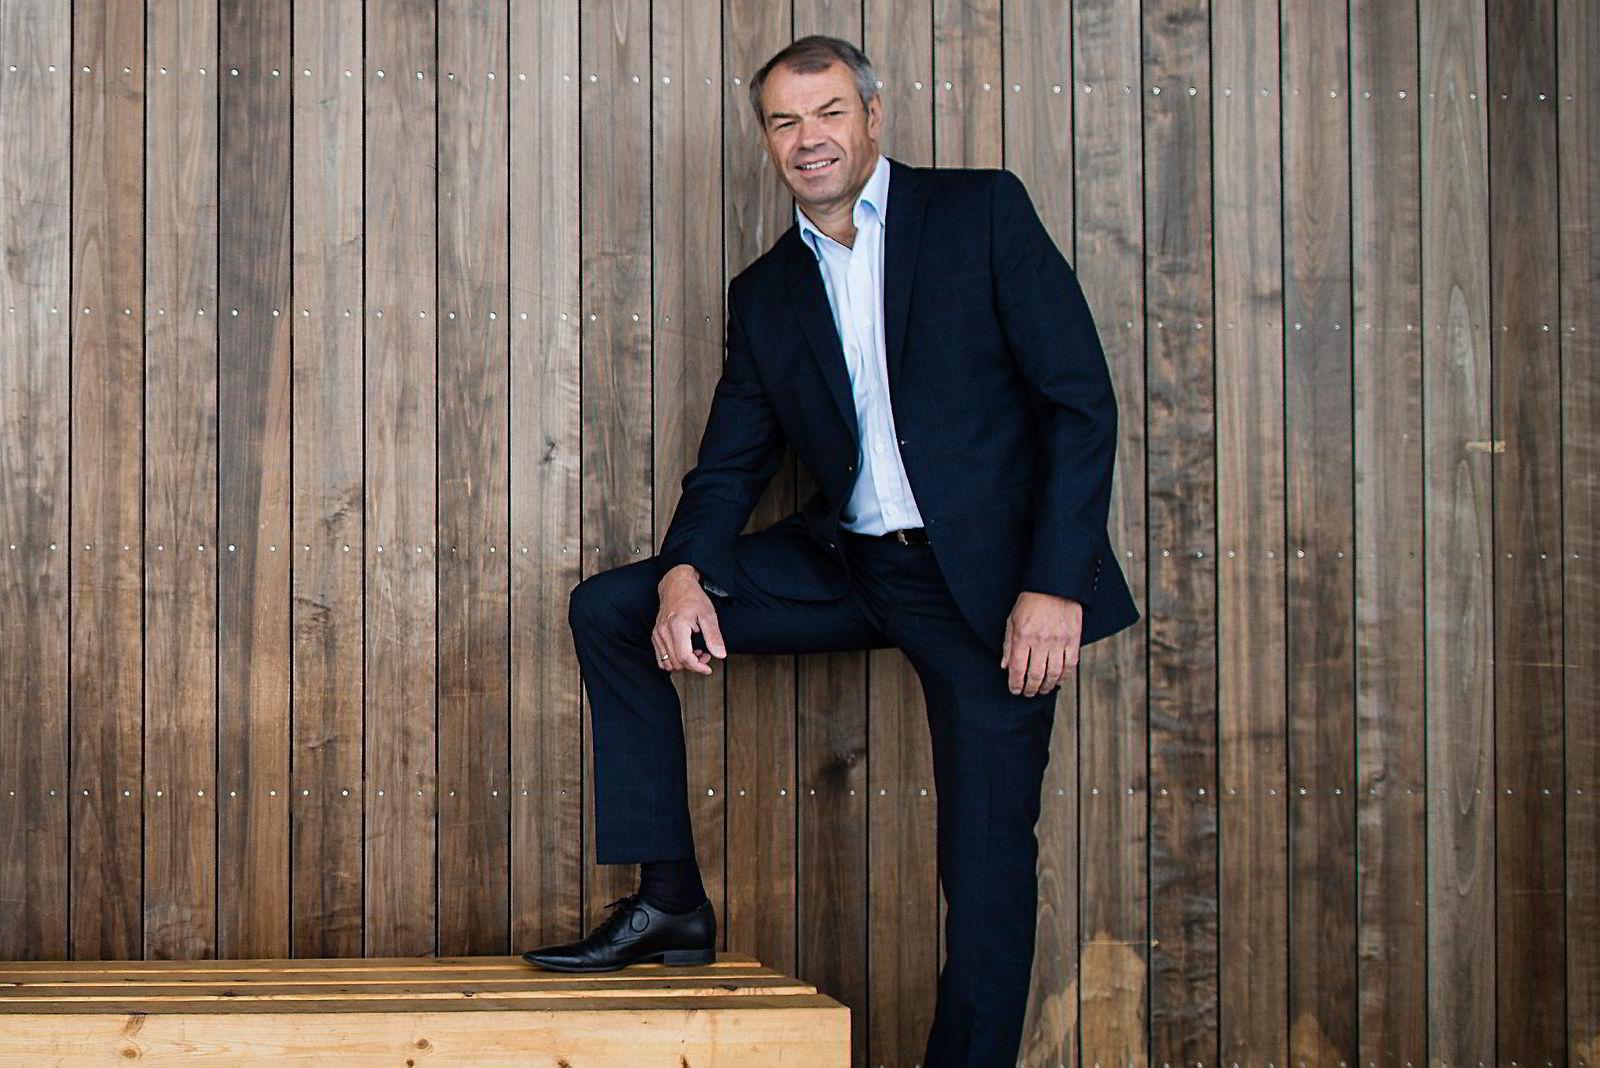 Konsernsjef Arne Austreid i Sparebank 1 SR-Bank venter lavere fortjeneste. Foto: